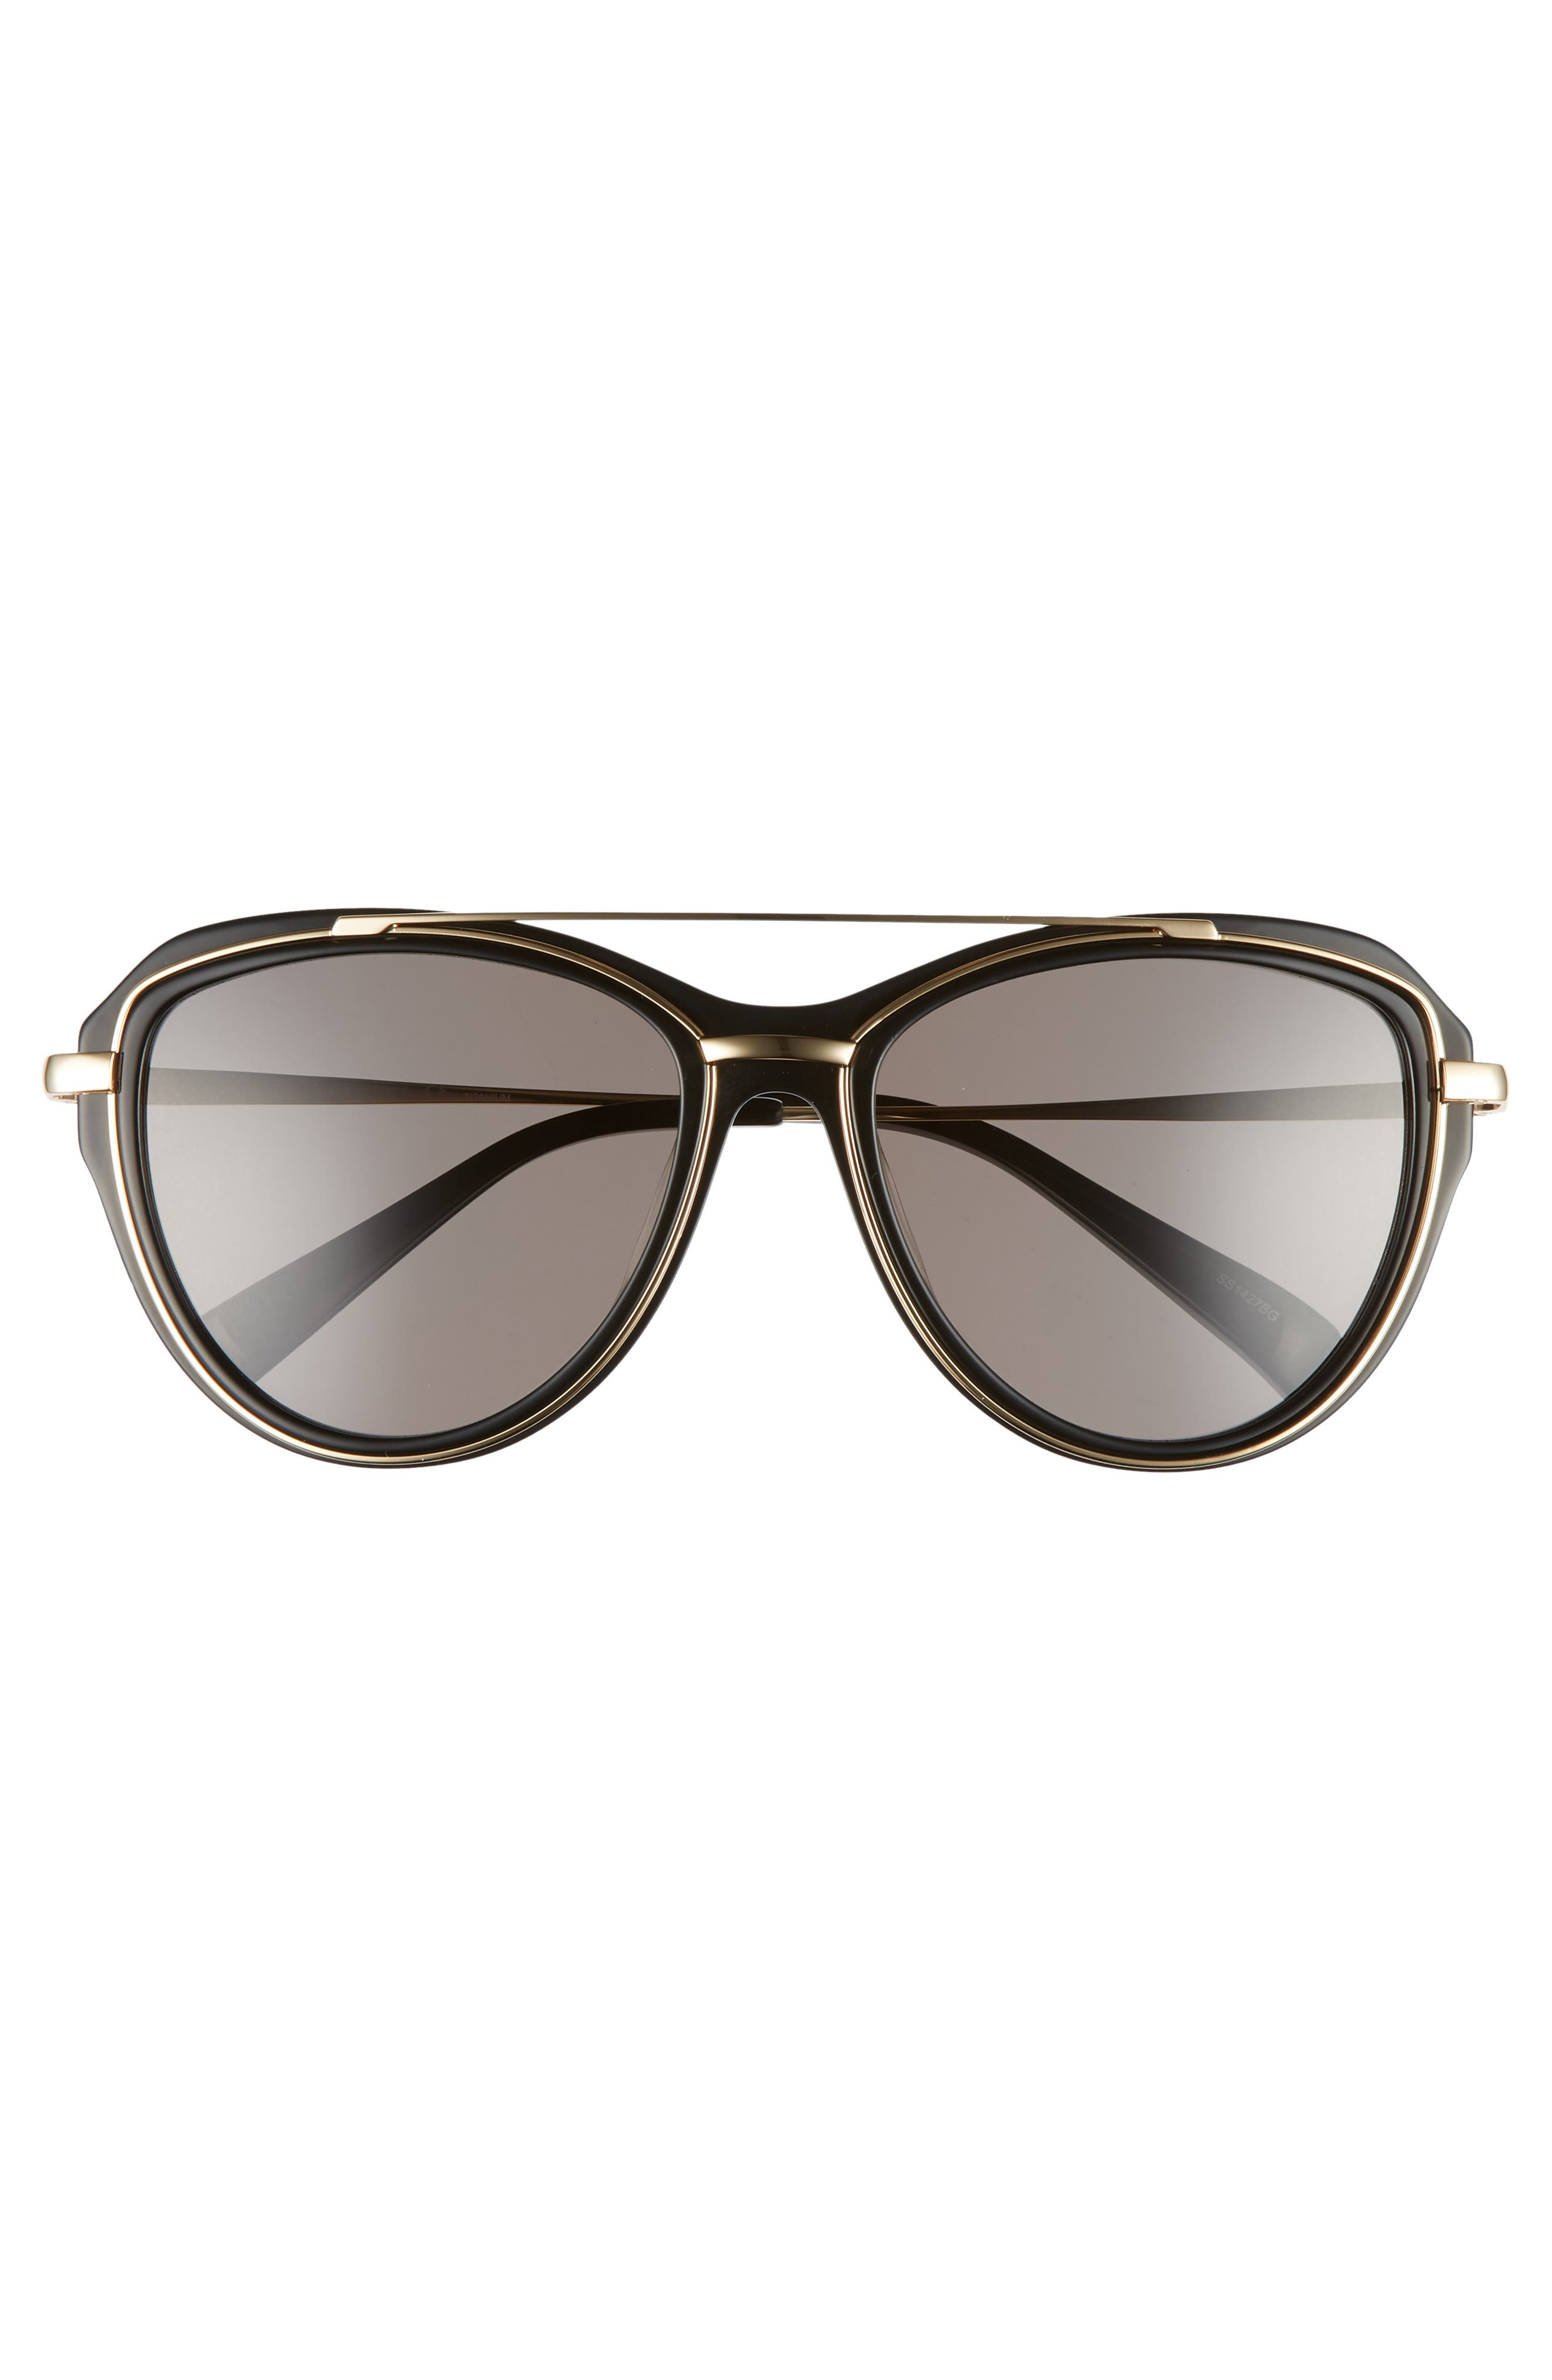 BLANC & ECLARE Marrakesh 57mm Aviator Sunglasses,                             Alternate thumbnail 3, color,                             Black/ Gold/ Smog Grey